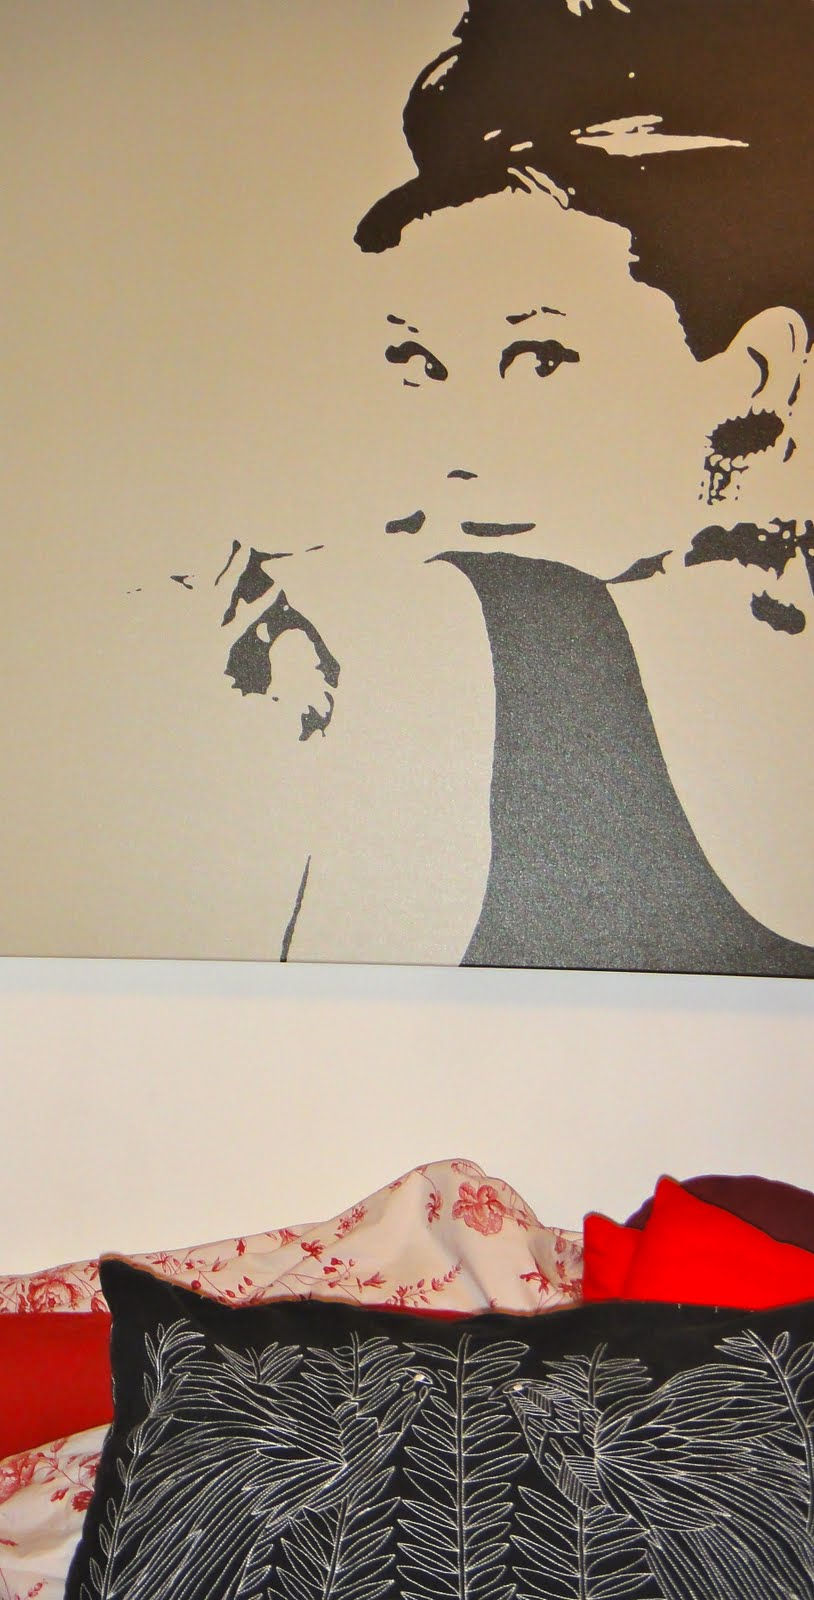 Images corals cognacs for Ikea audrey hepburn